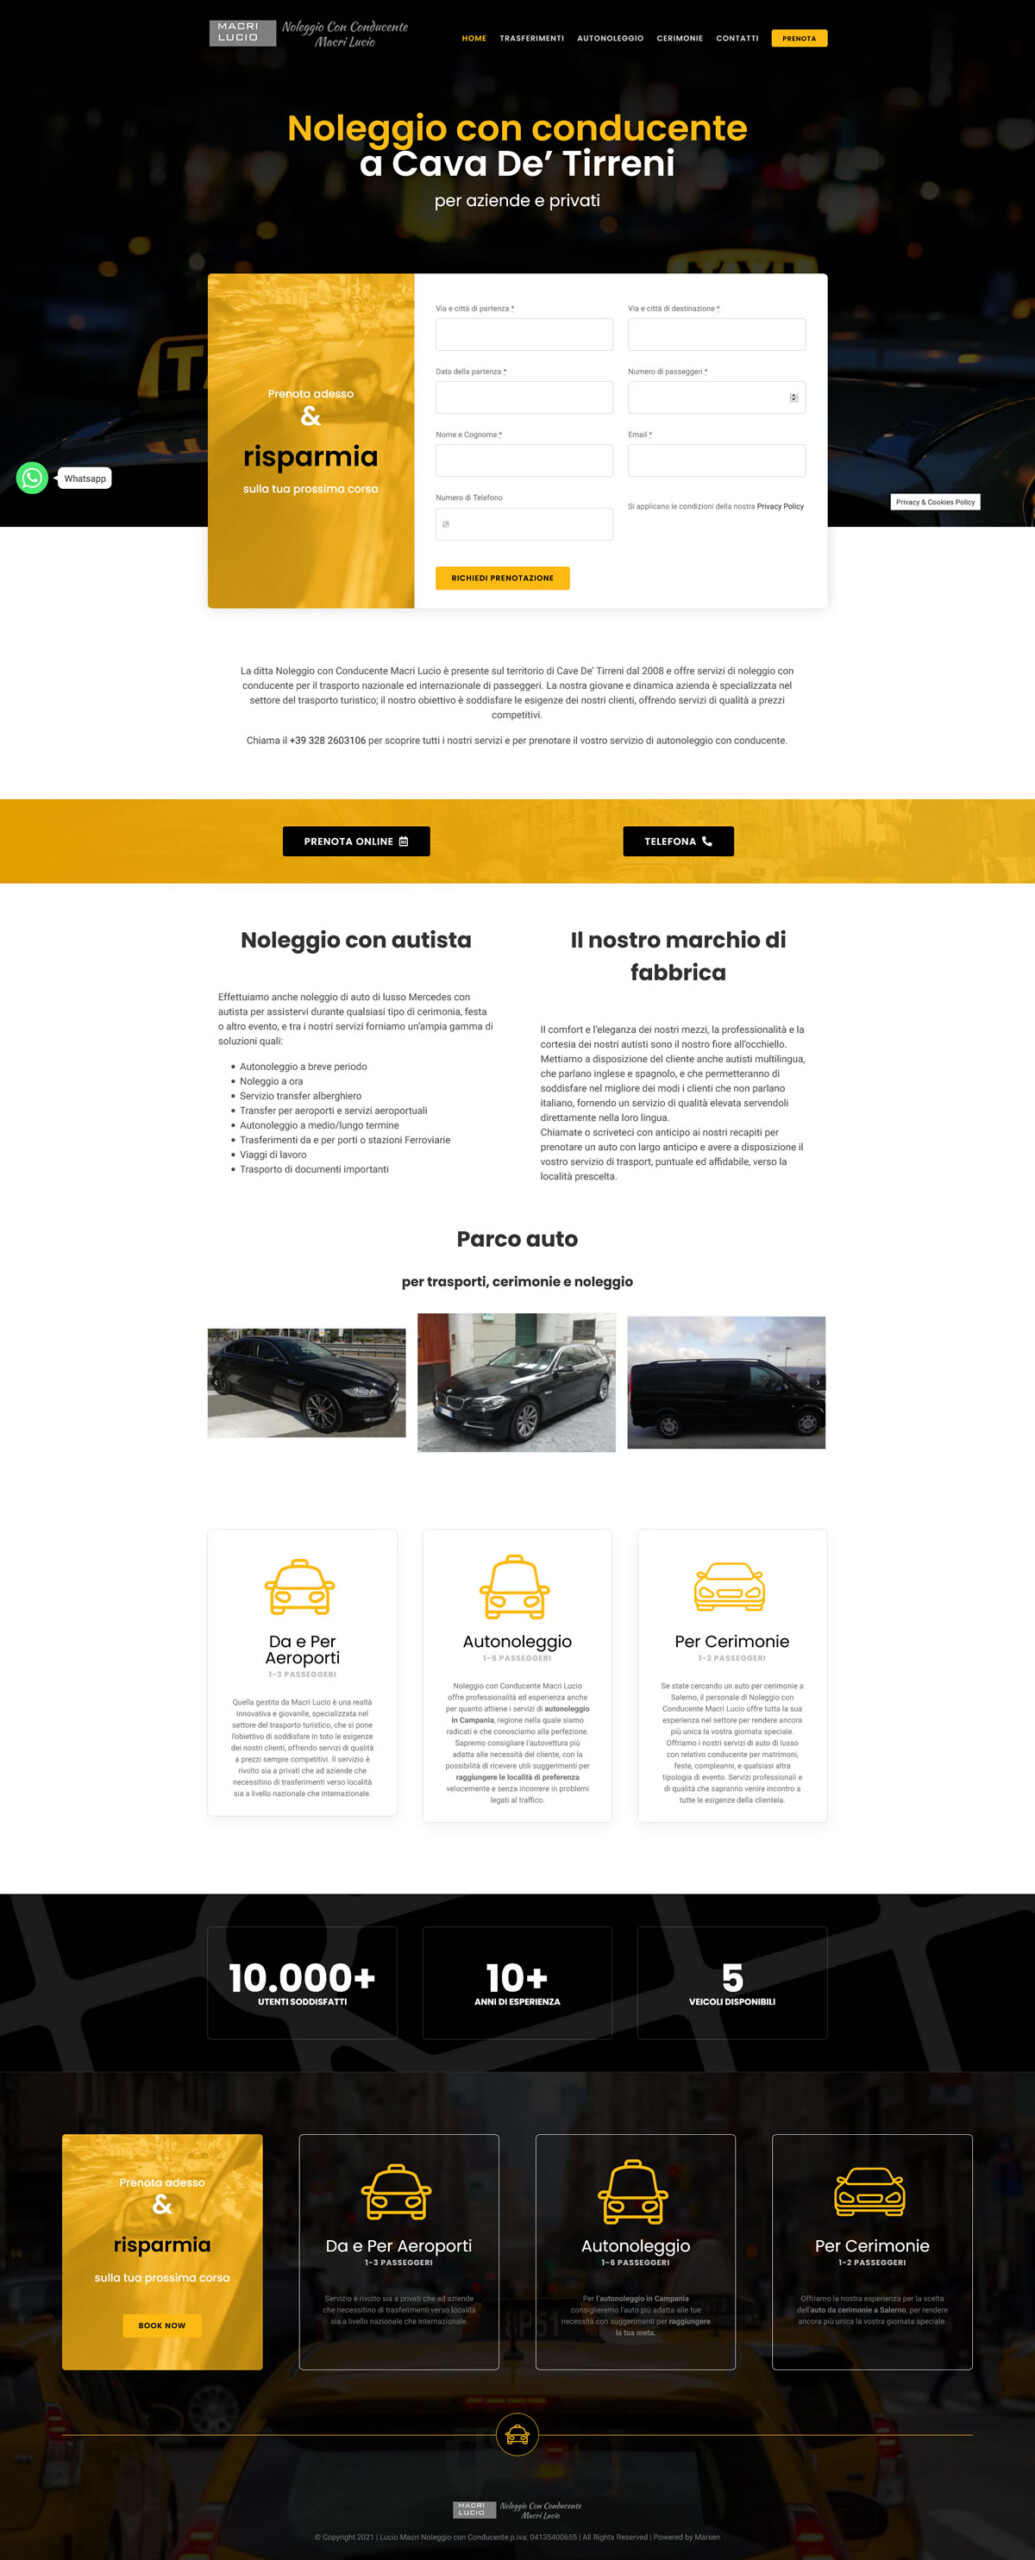 Taxi Cava - NCC a Cava de' Tirreni - 7Web Portfolio Web WordPress, siti web taxi